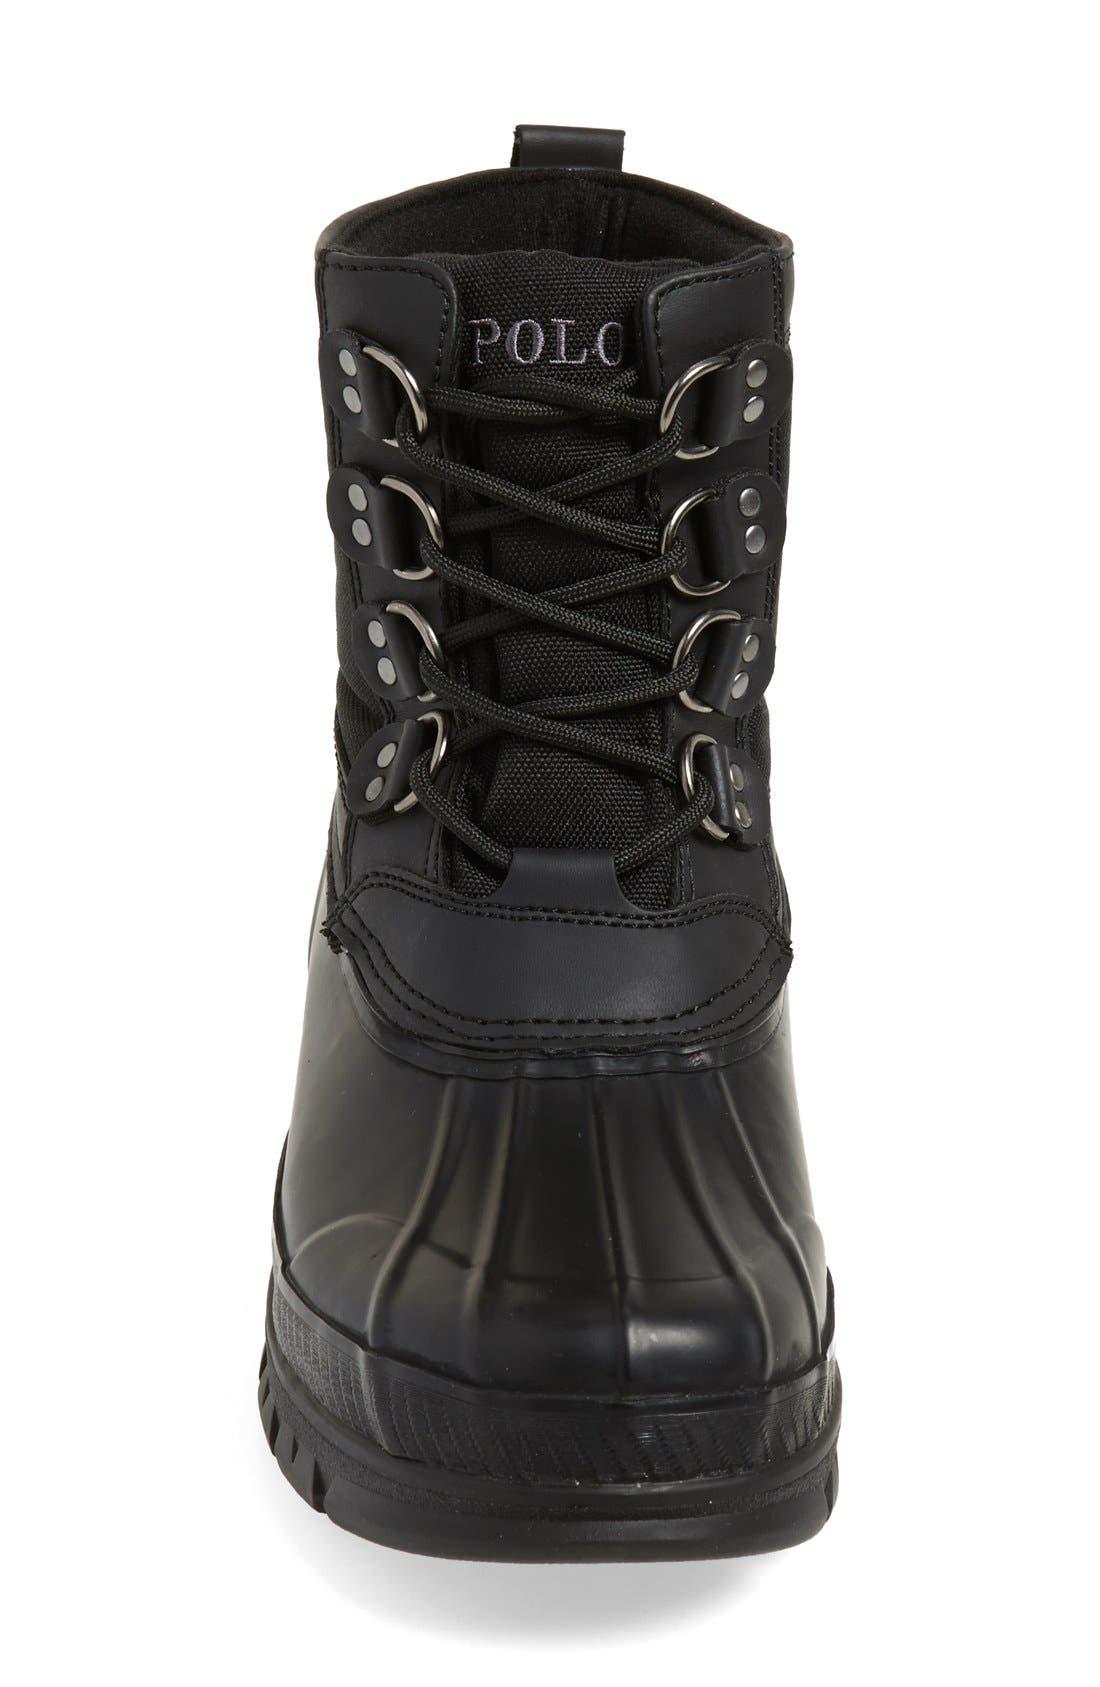 POLO RALPH LAUREN, 'Crestwick' Tall Boot, Alternate thumbnail 4, color, 001